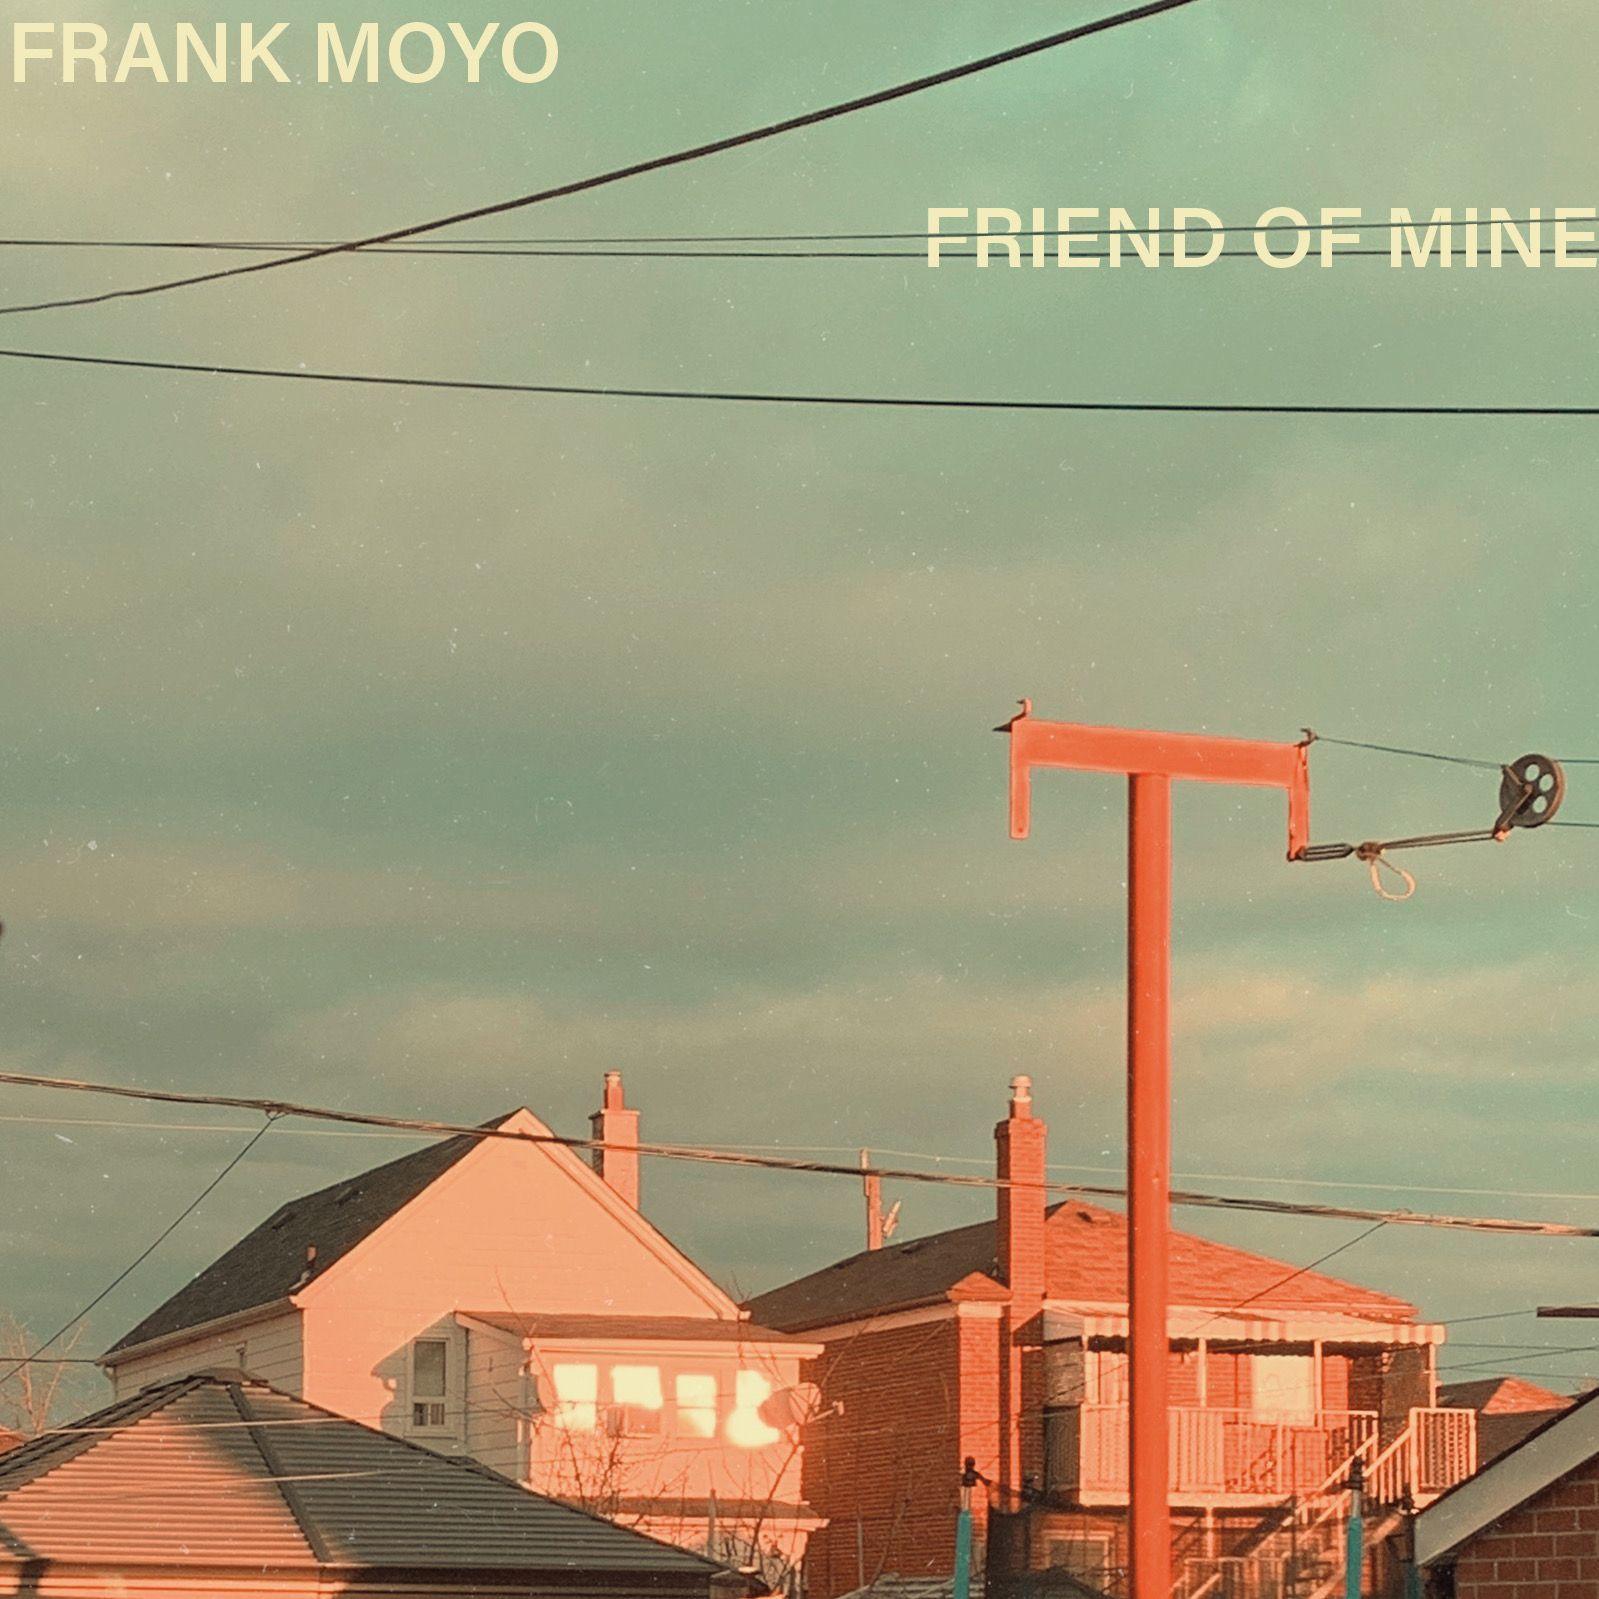 frank-moyo-friend-of-mine-artwork.jpg